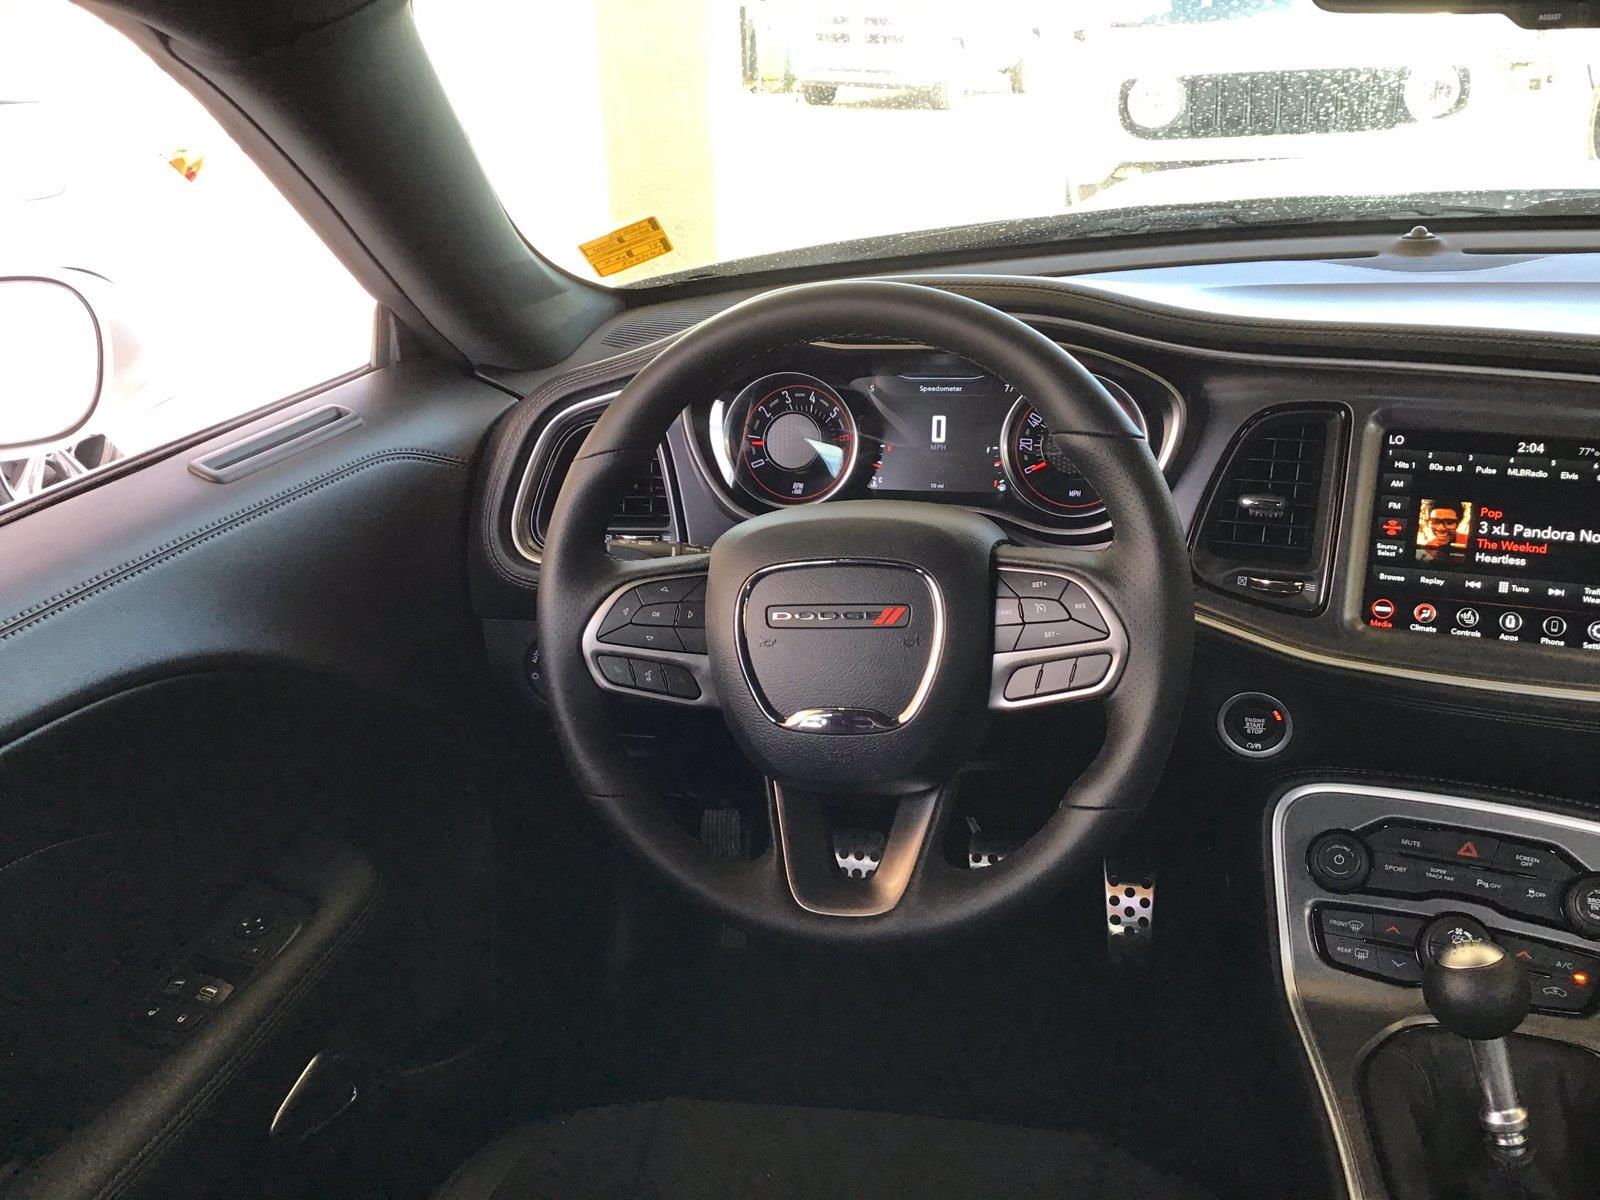 New 2020 DODGE Challenger R/T